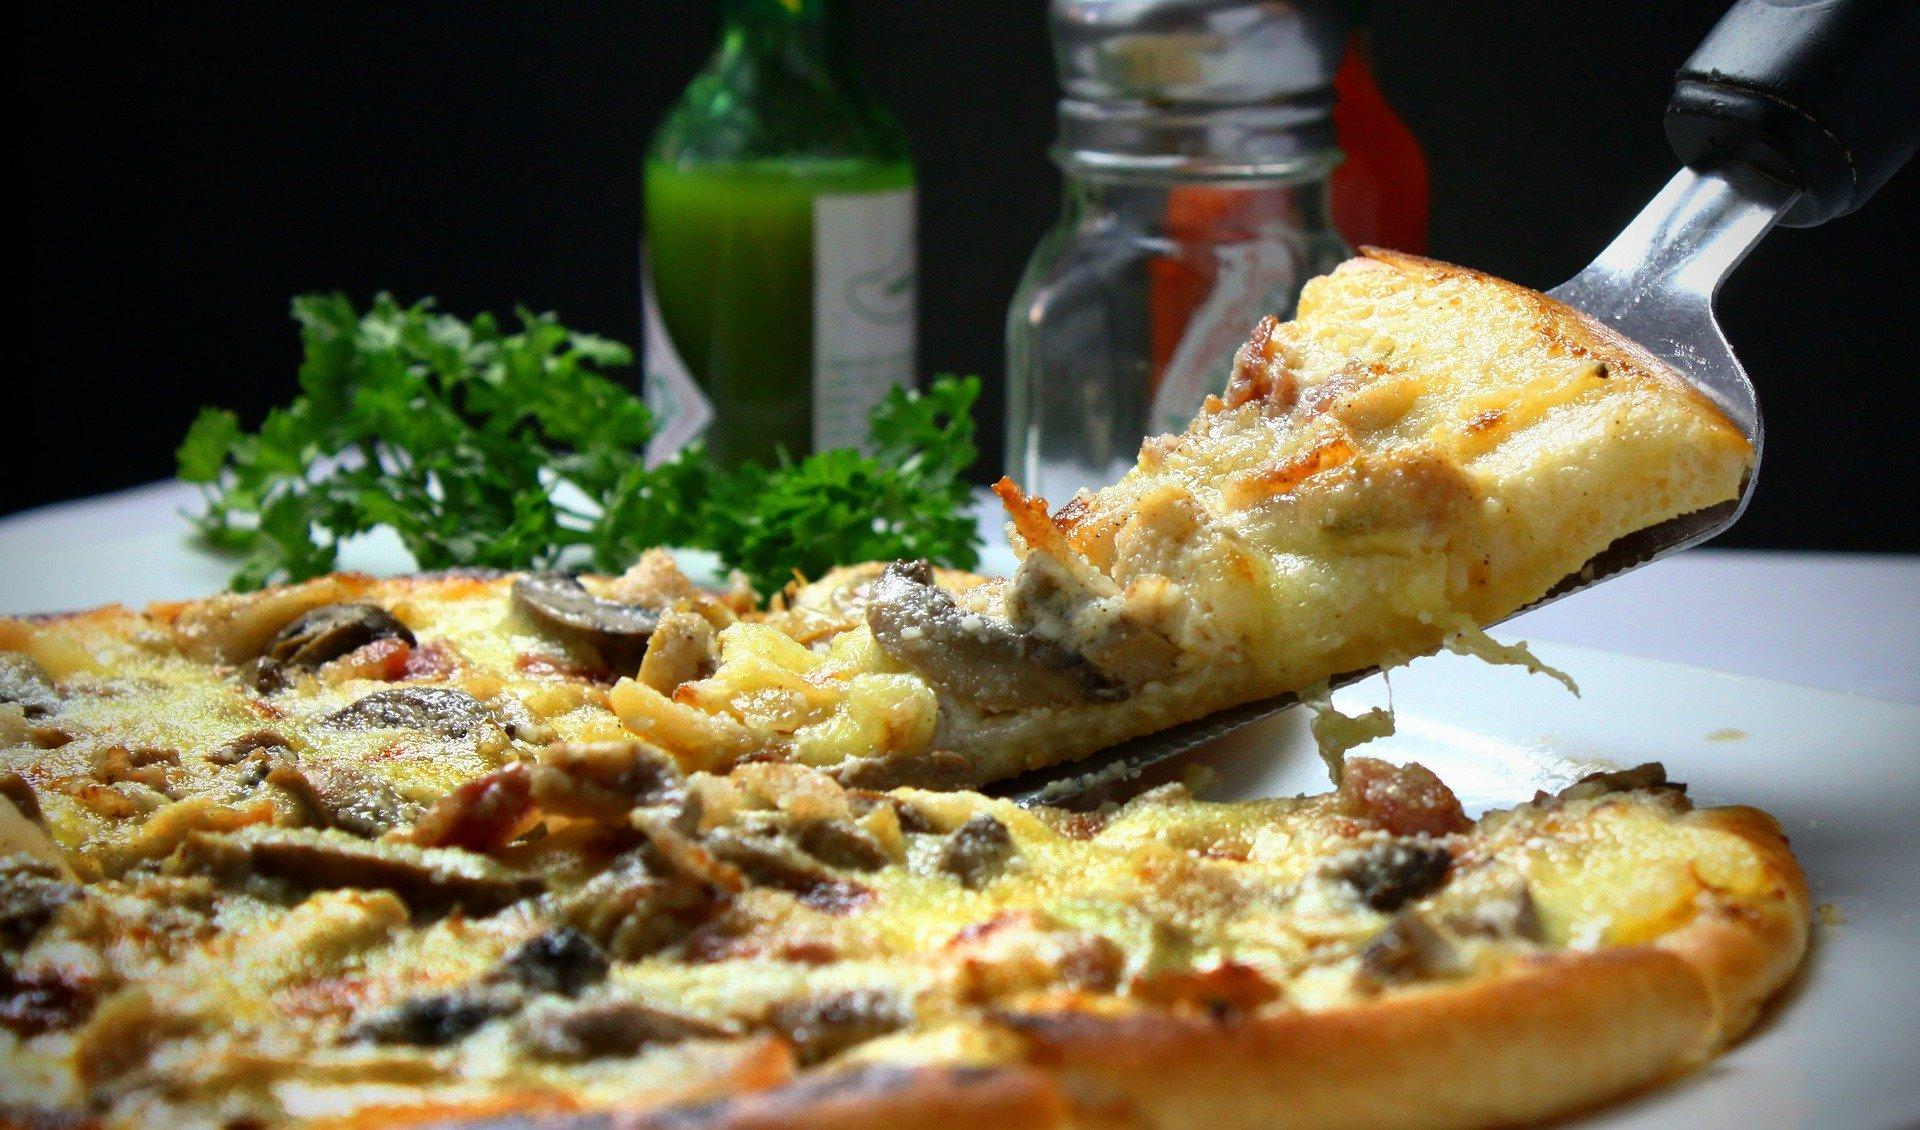 Gluten Free Pizza Bases Need Gluten-free Recipes